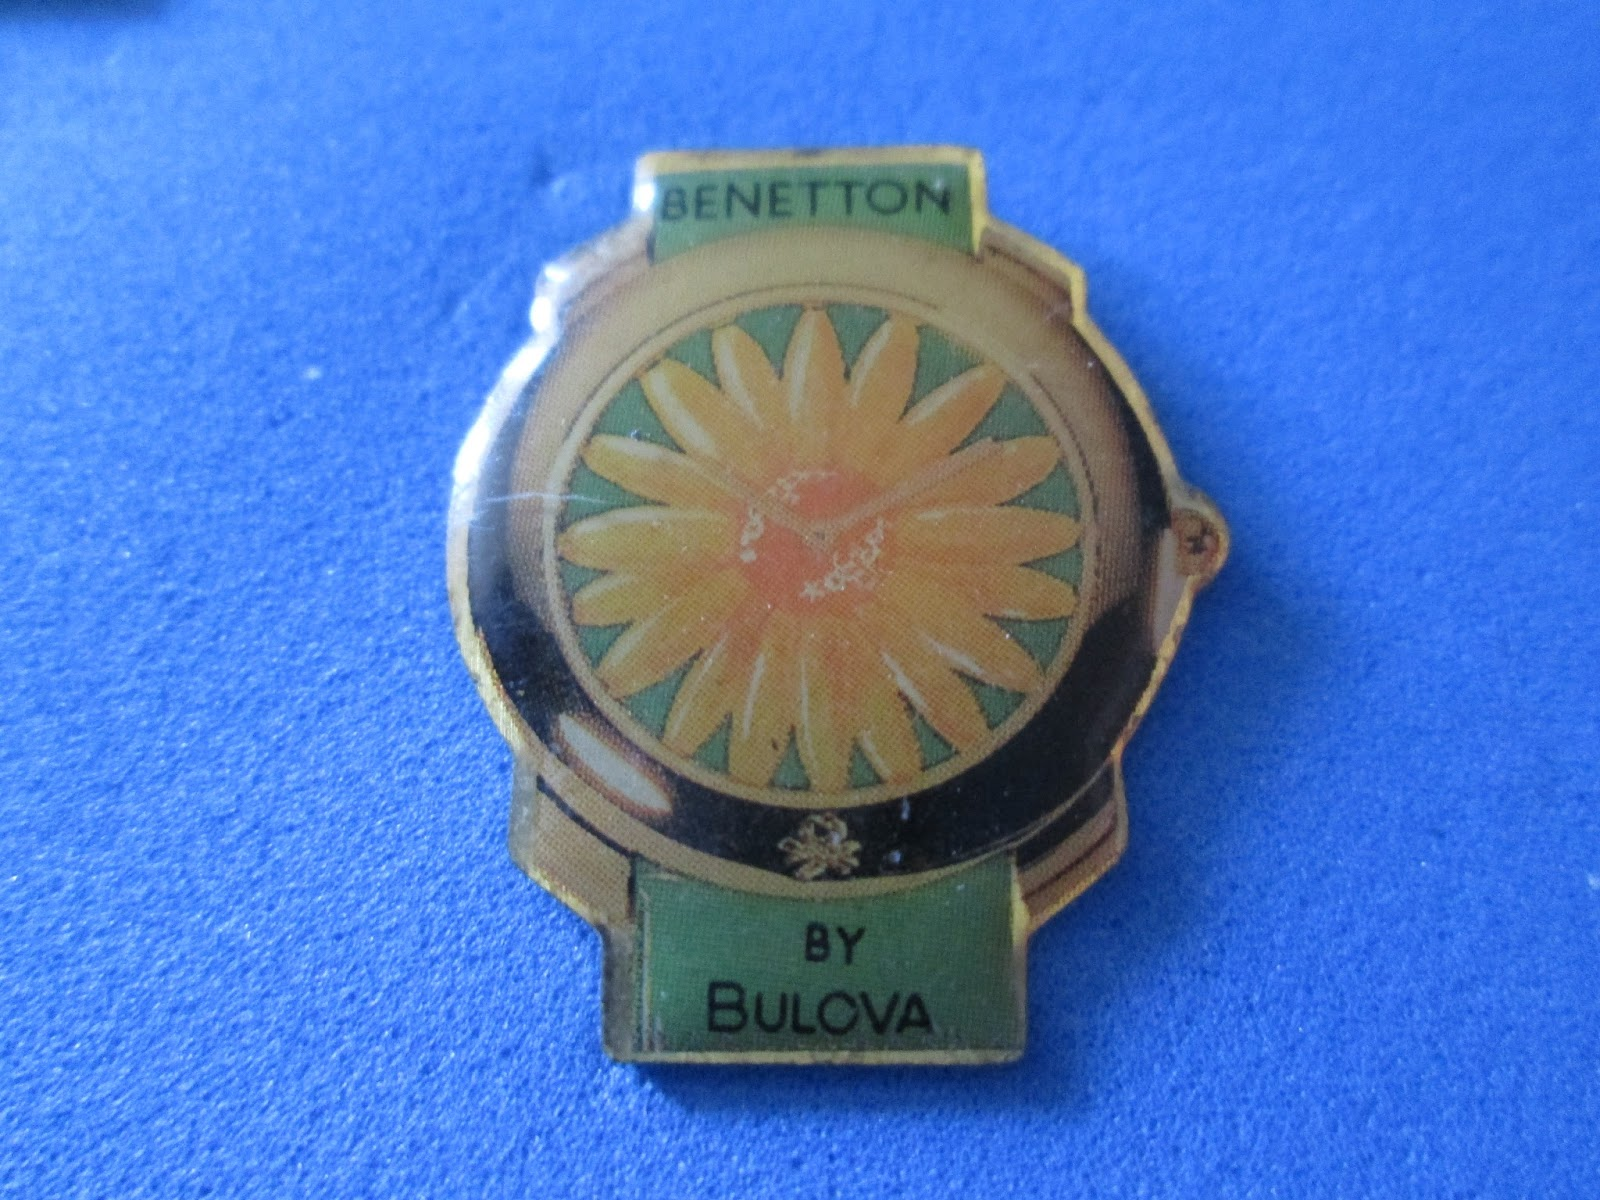 4b2625a0d92 PINS DO JOAO  Relógio Benetton by Bulova